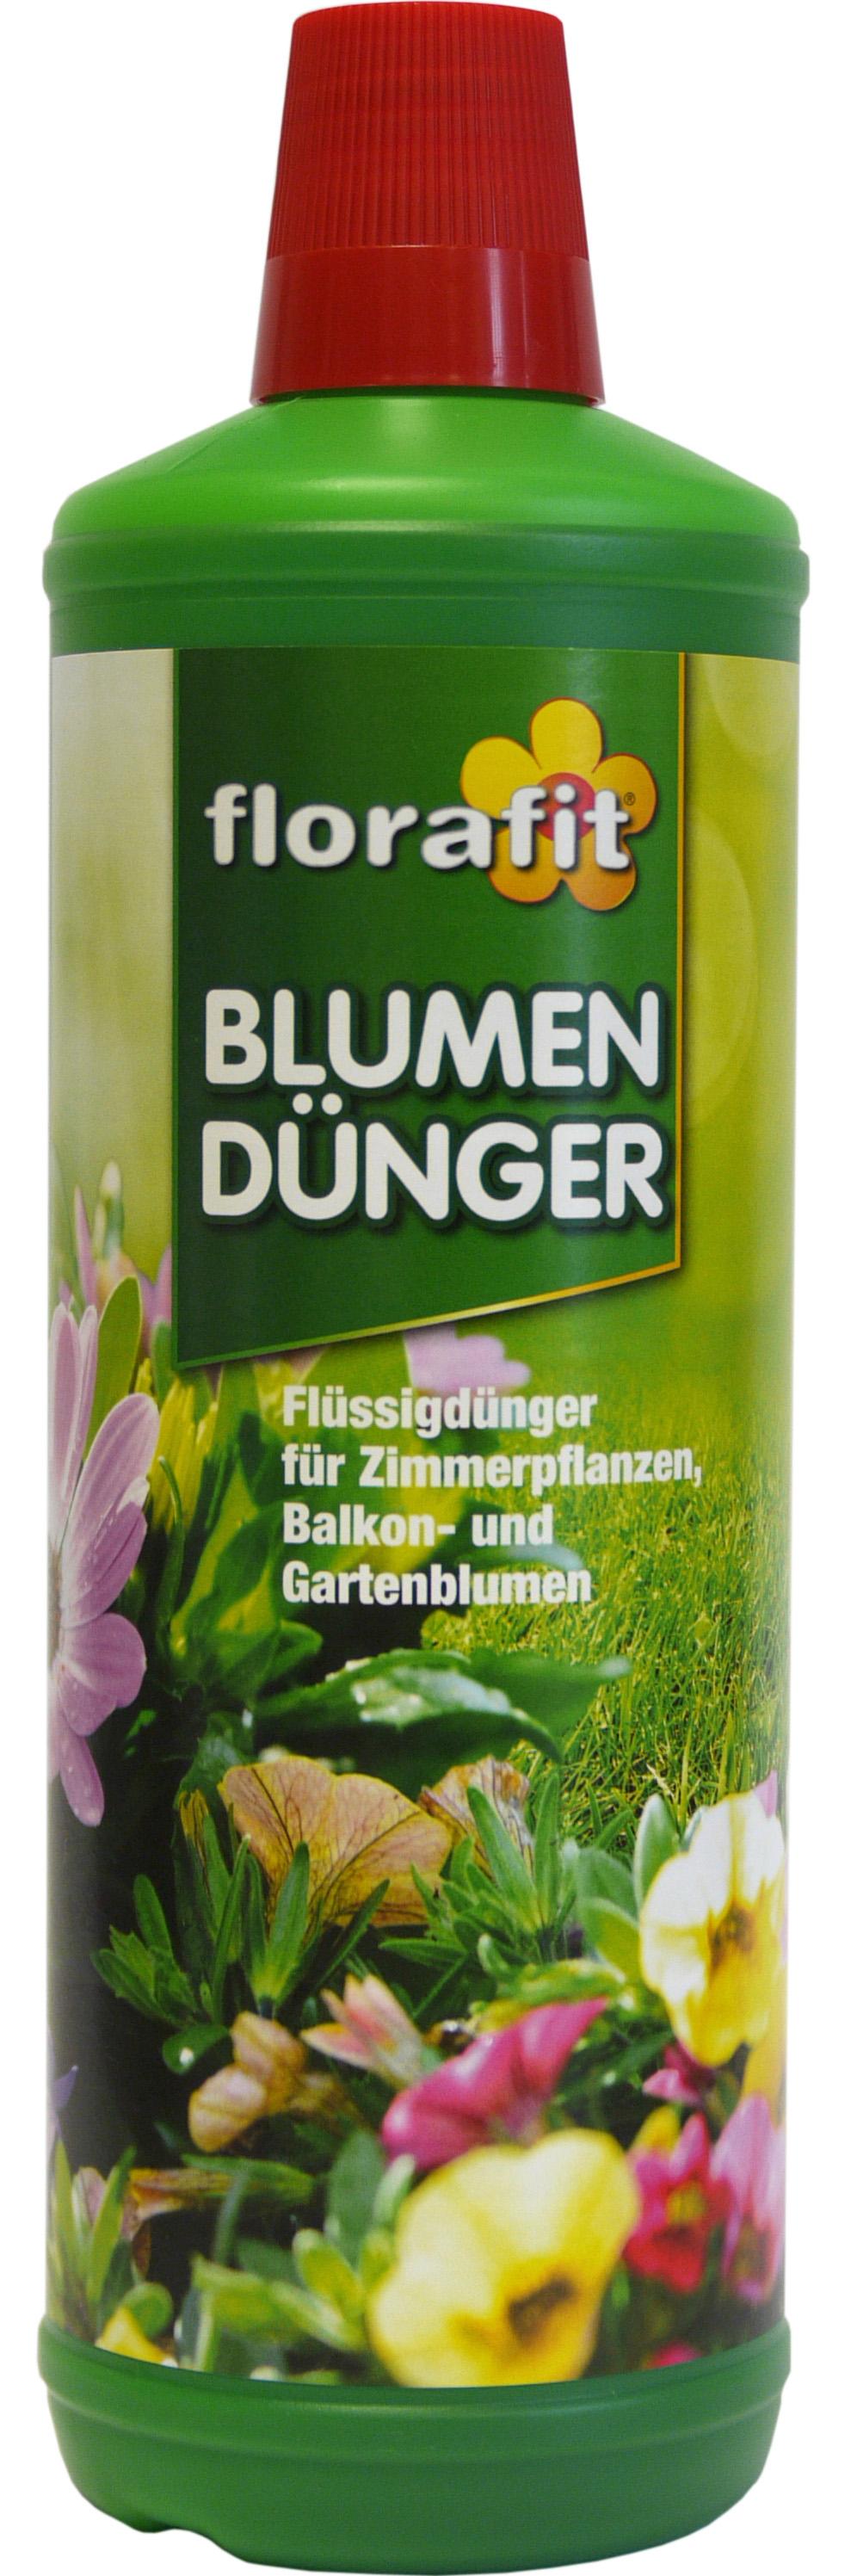 02200 - florafit Blumendünger 1000 ml